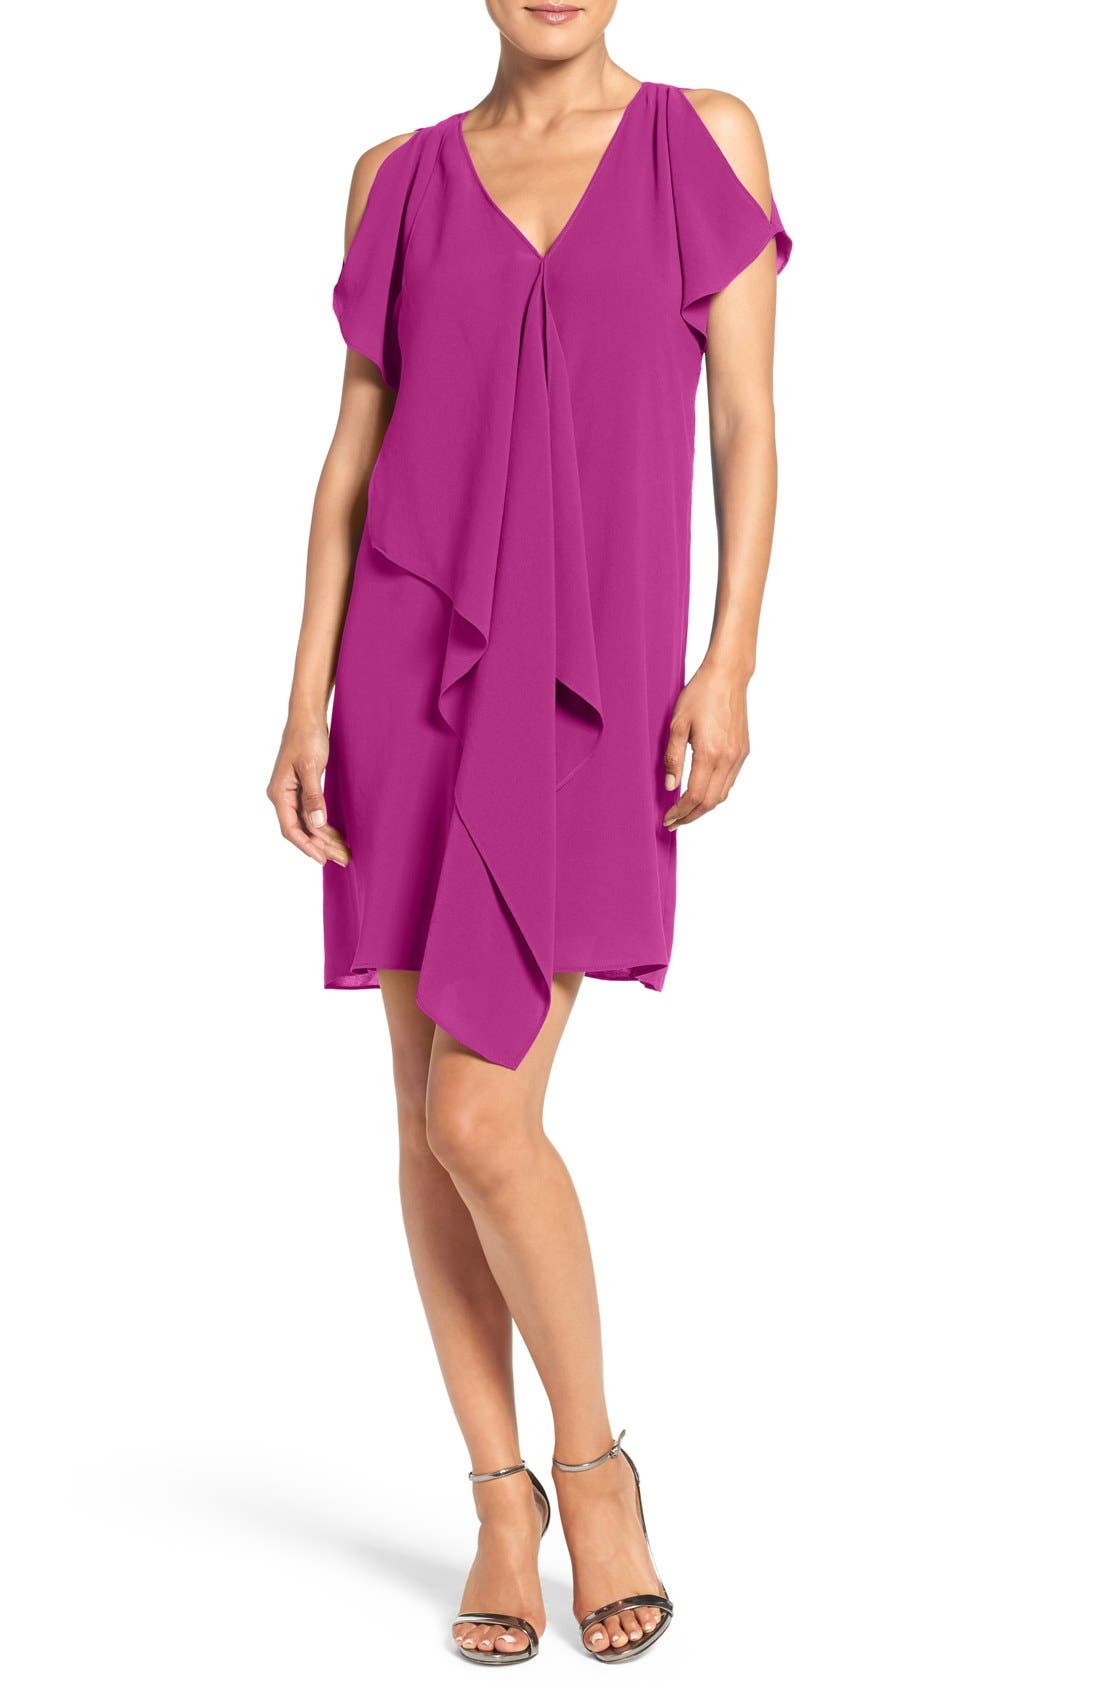 Alternate Image 1 Selected - Adrianna Papell Cold Shoulder Draped Shift Dress (Regular & Petite)